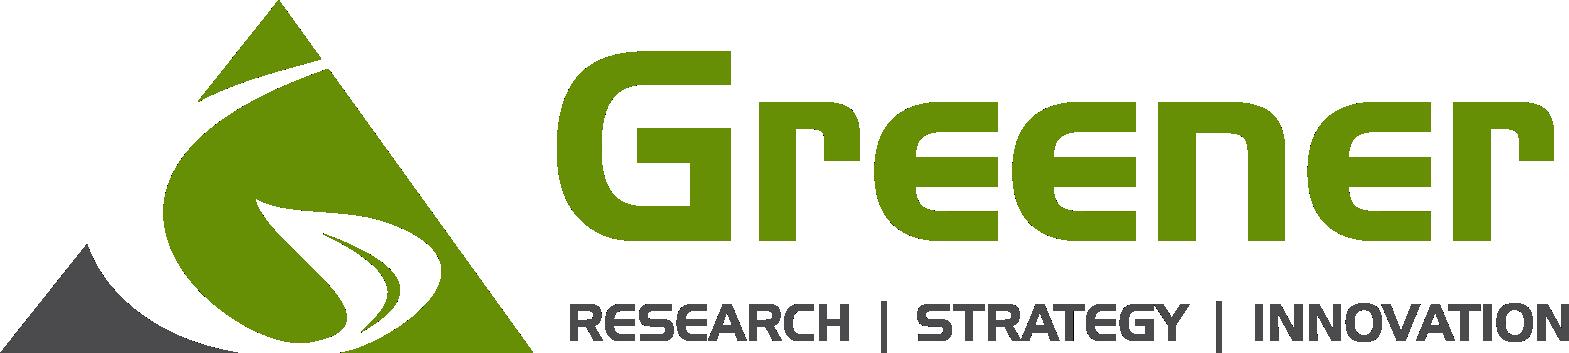 Logo greener horizontal alterado x6